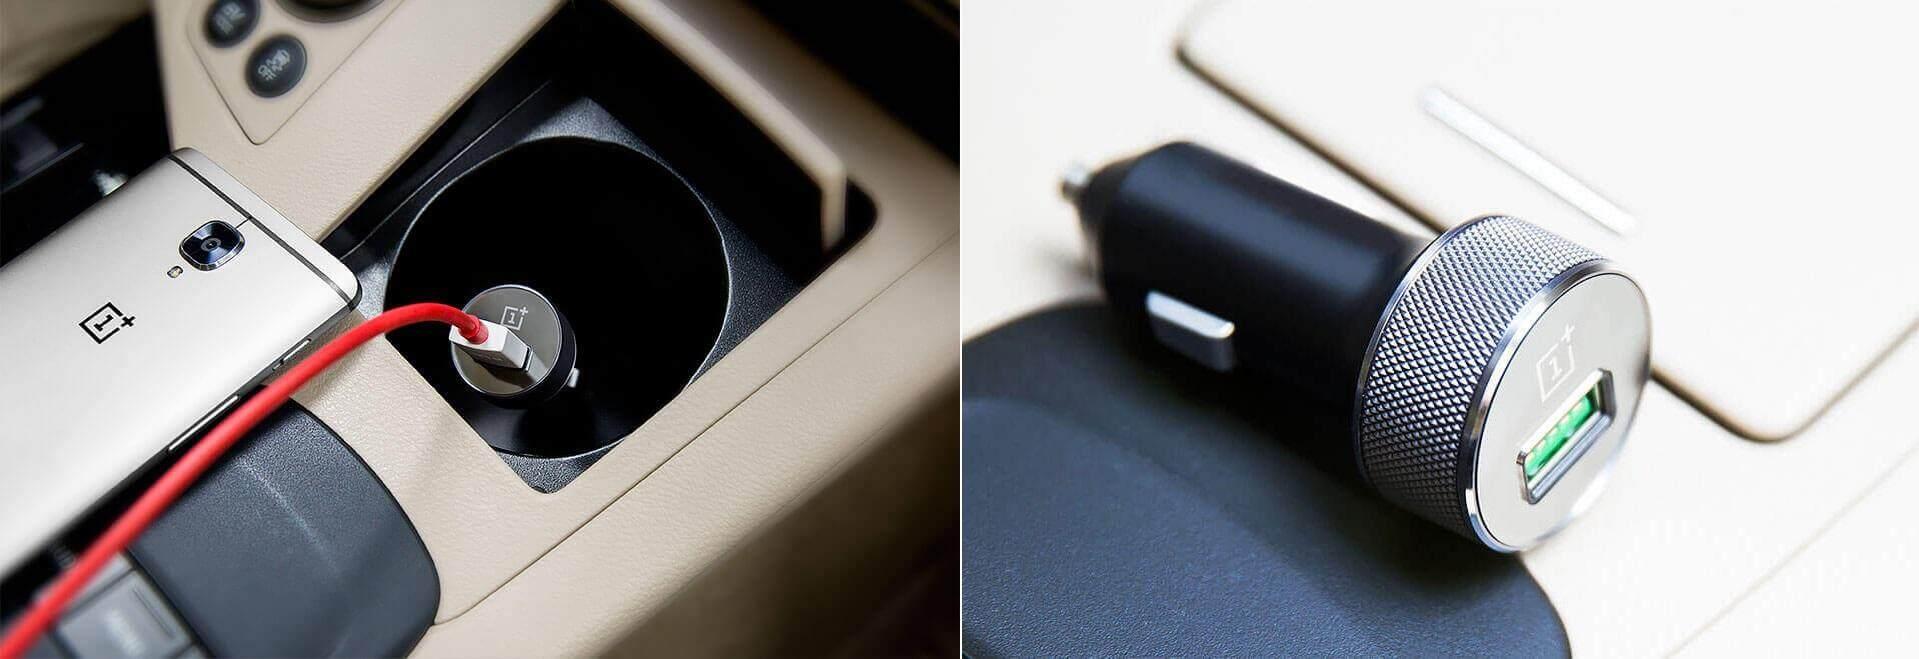 car_charger-2.jpg